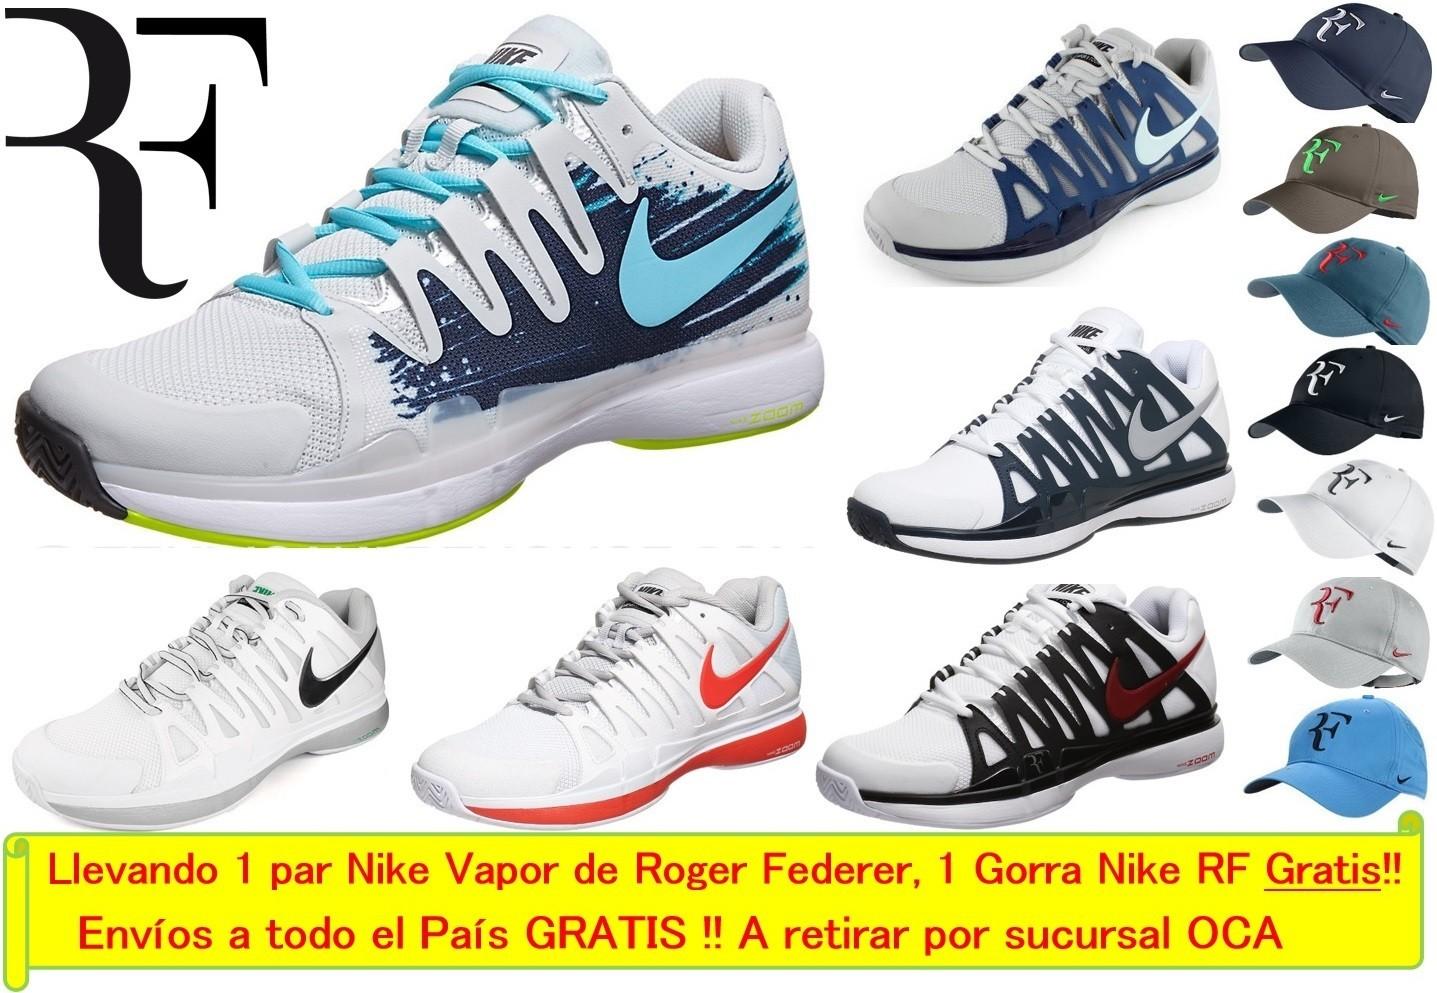 Guido Tenis Pro (Deportes Y Fitness):        Federer